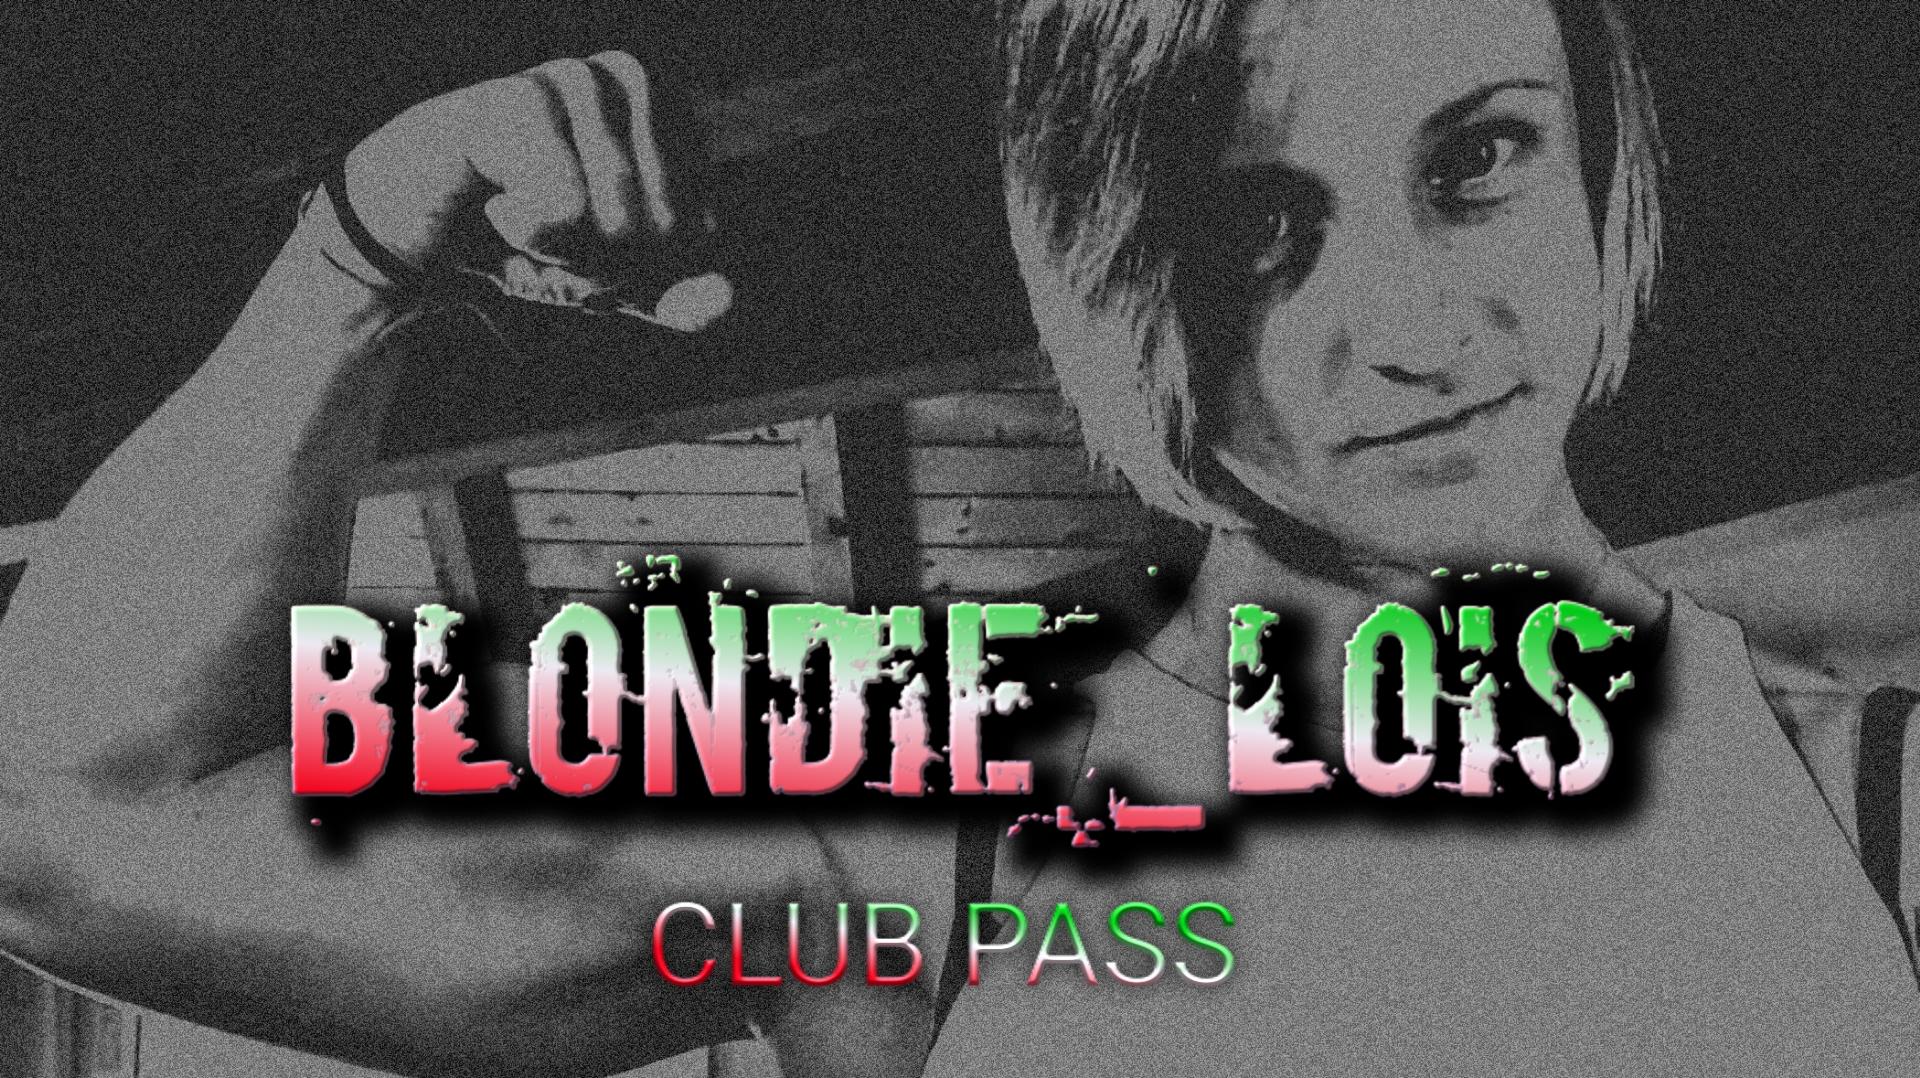 Blondie_lois Club Pass